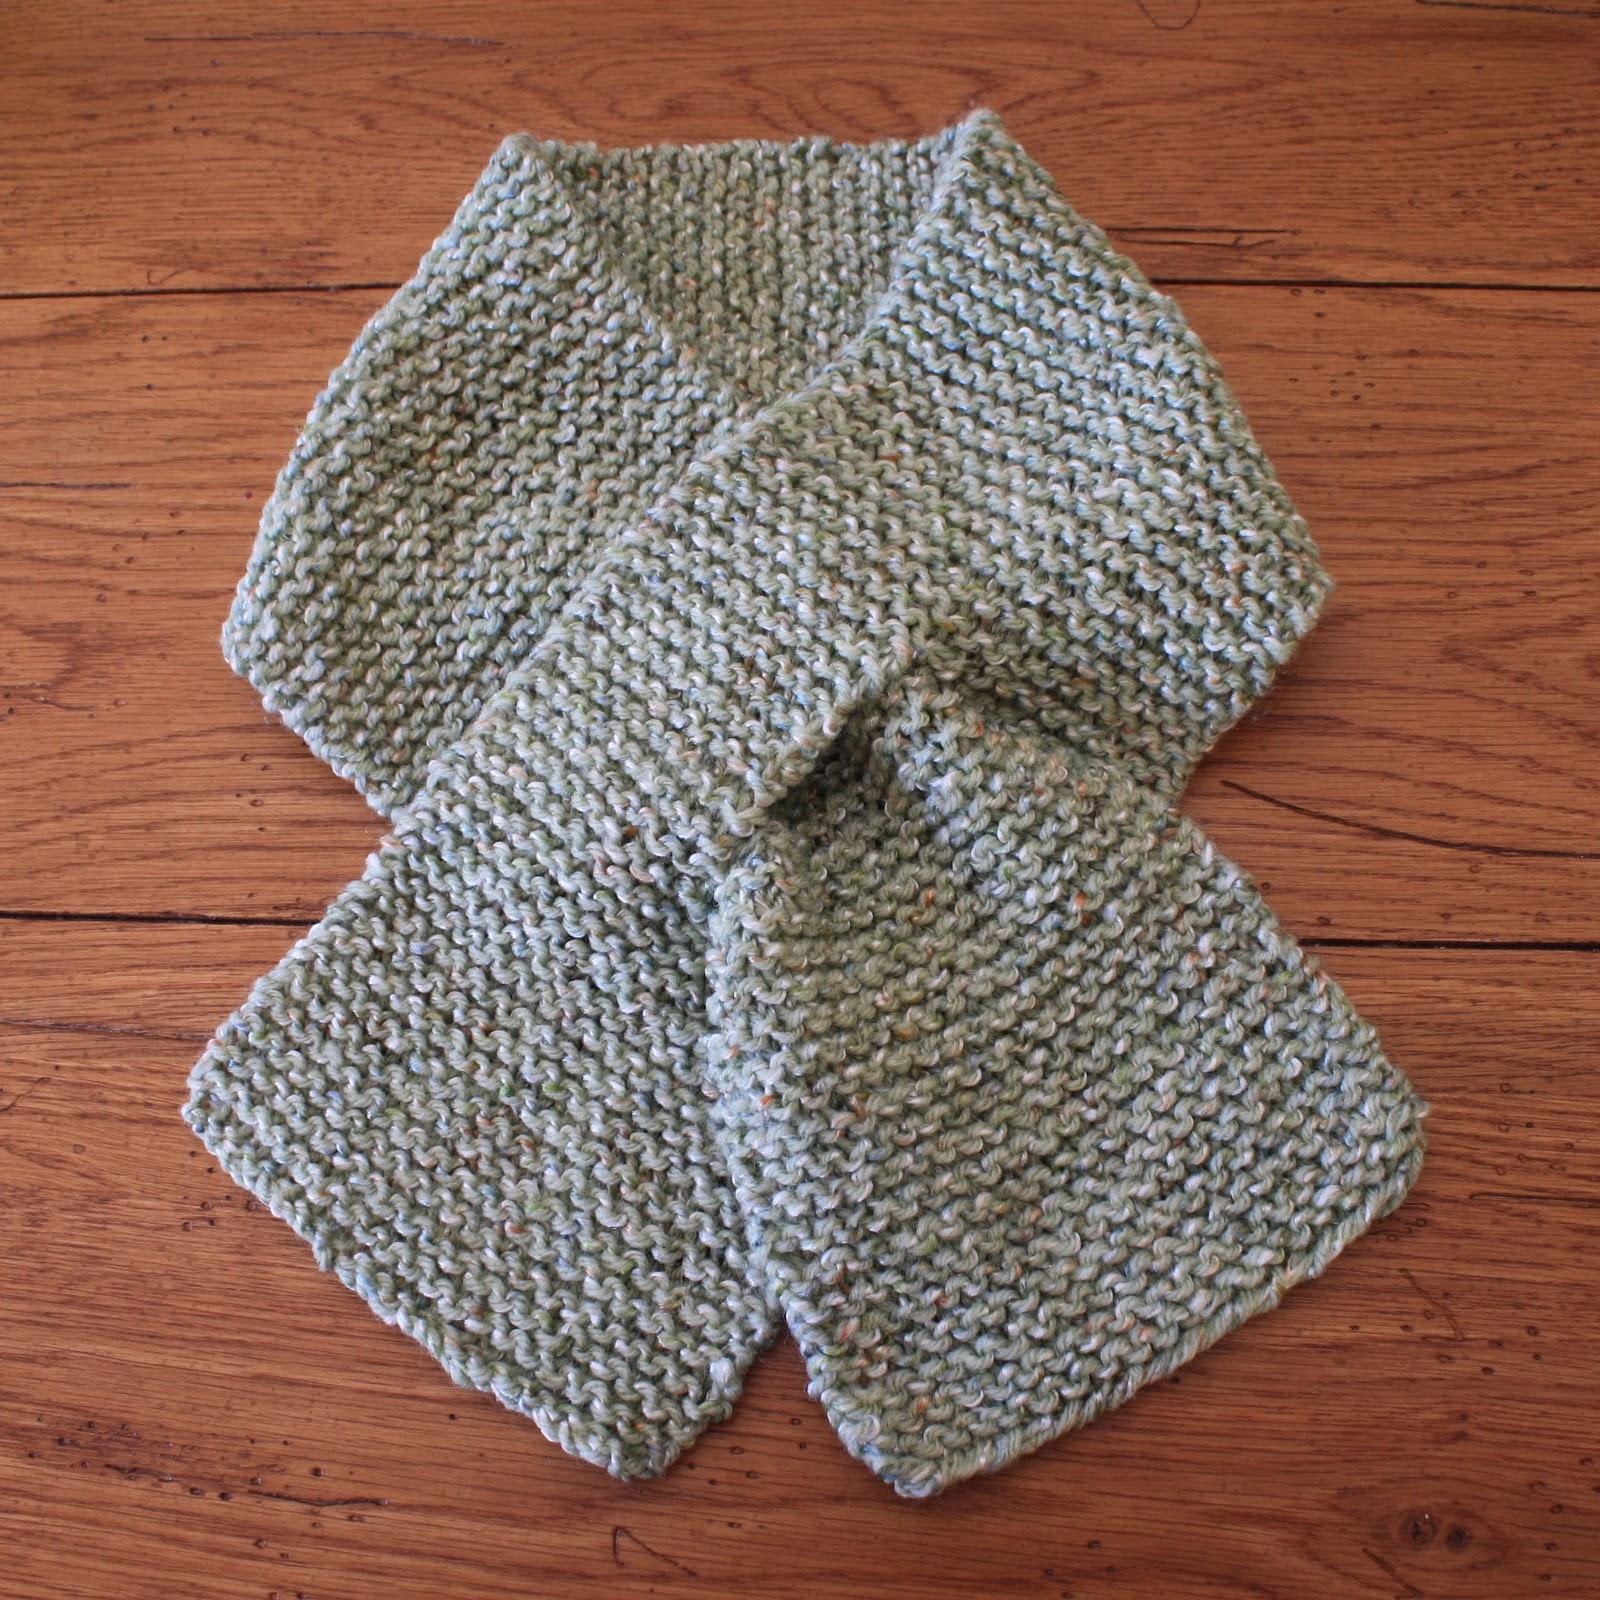 Knitting On The Net Buttonhole : Cora cooks knitting